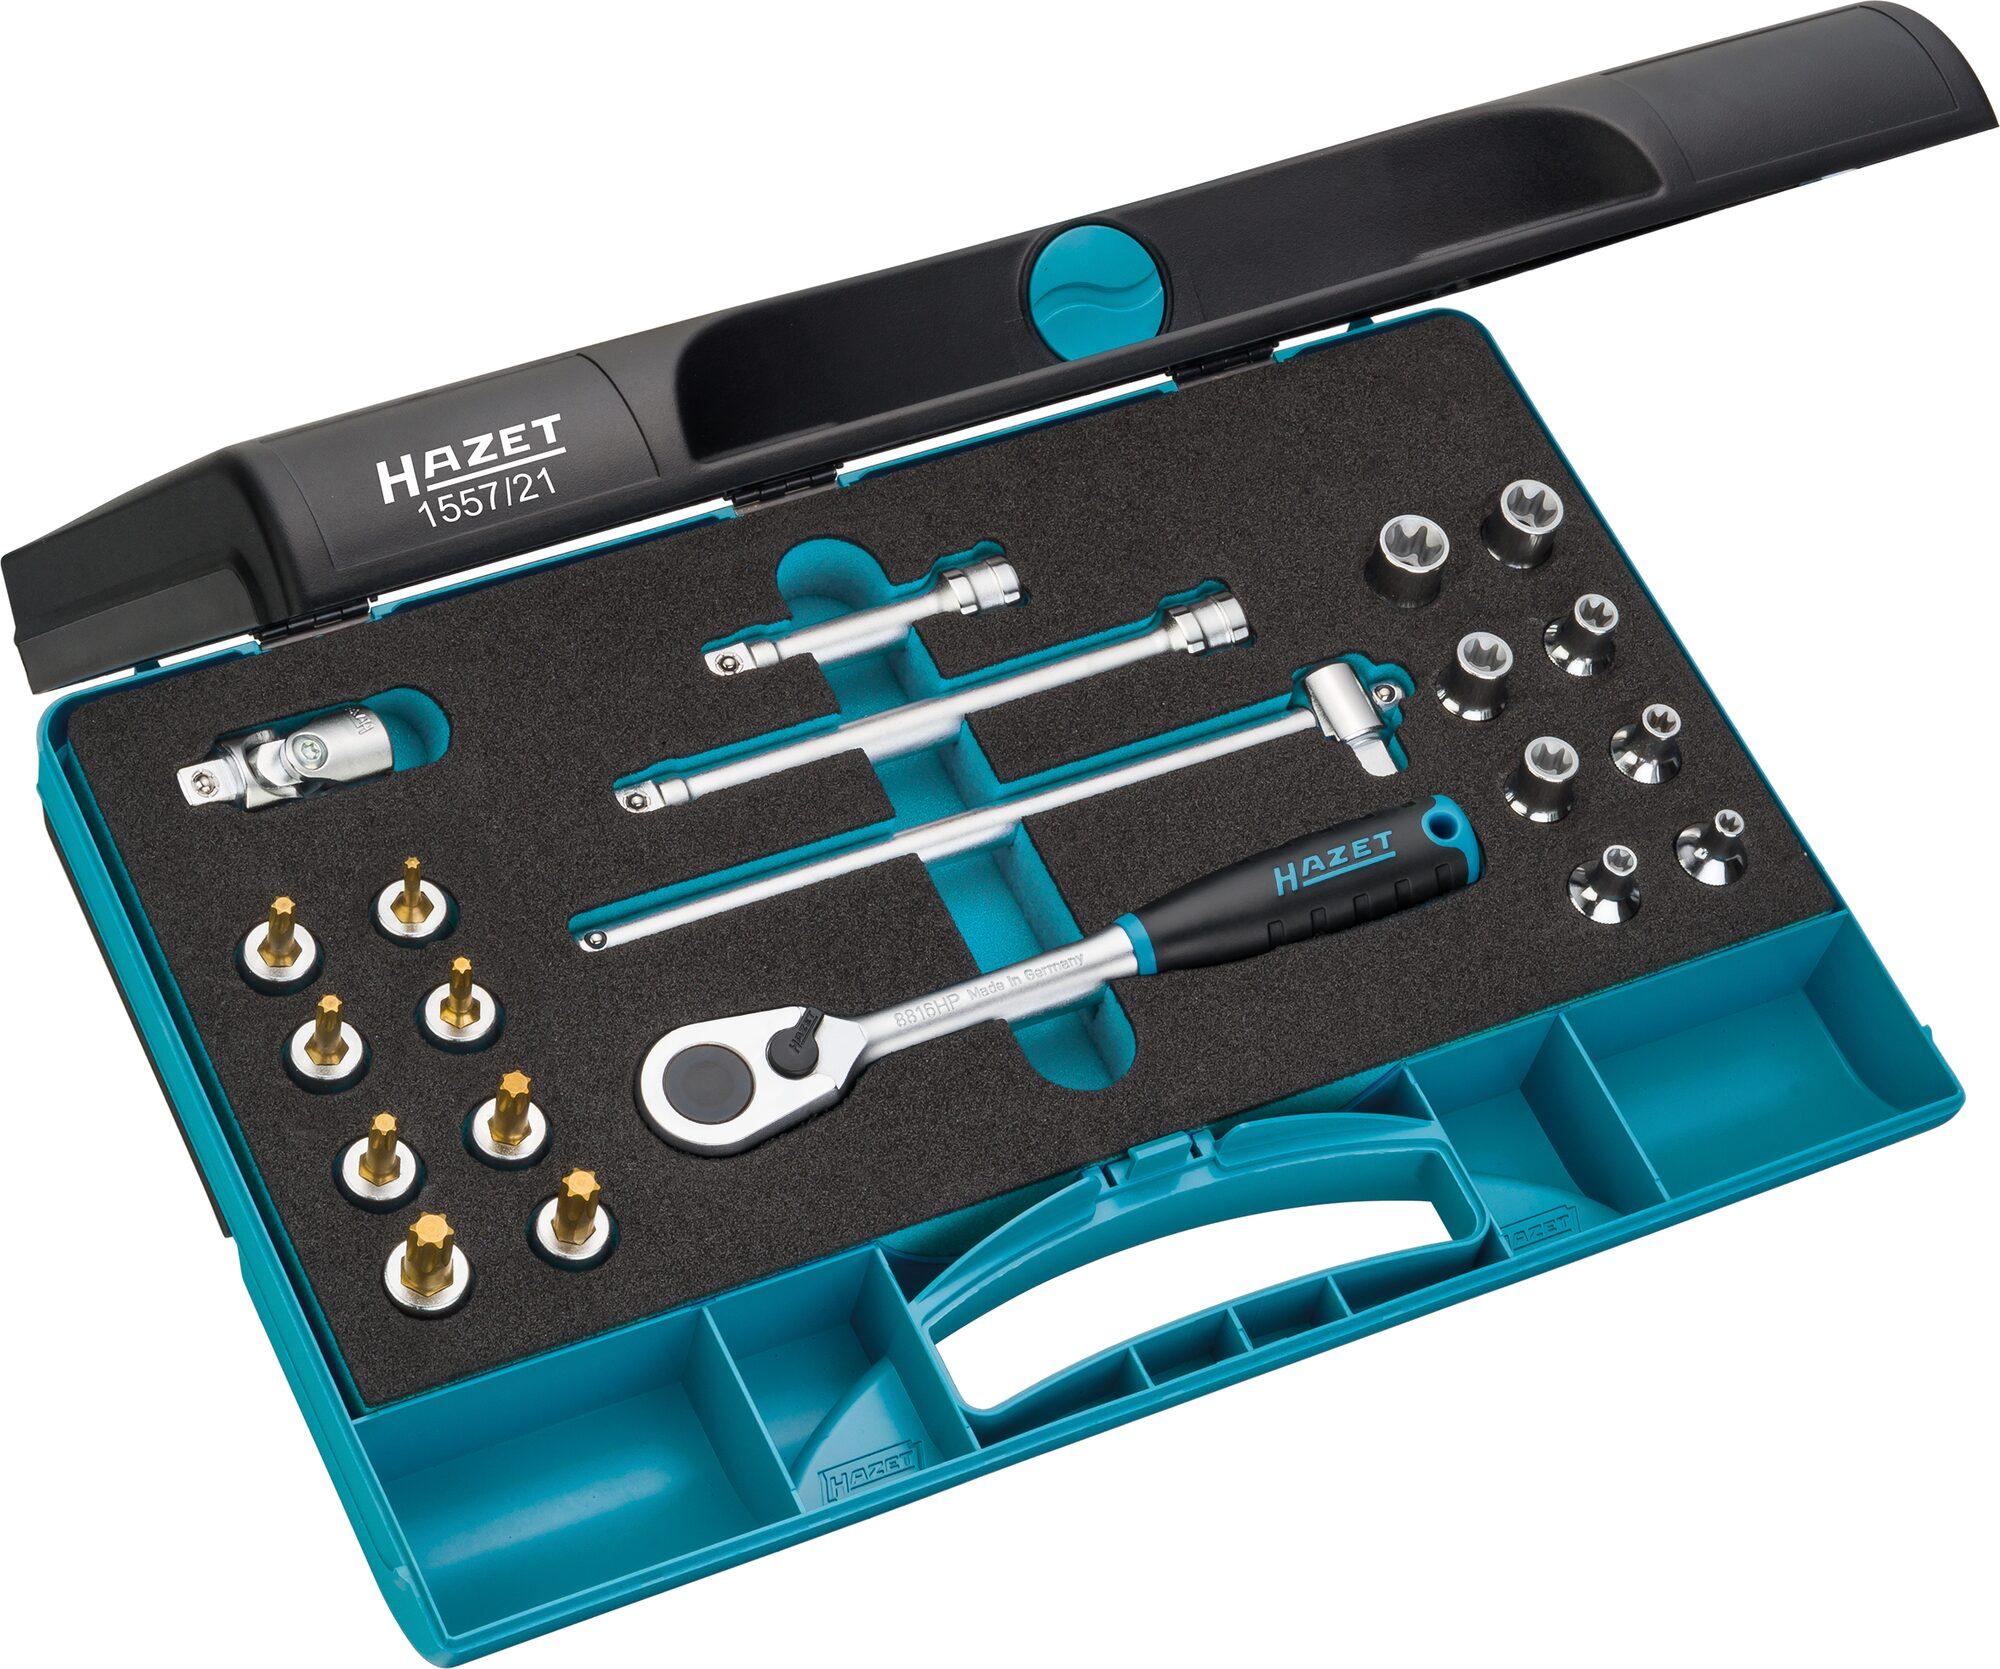 HAZET Werkzeug Satz TORX® 1557/21 ∙ Vierkant hohl 10 mm (3/8 Zoll) ∙ Außen TORX® Profil, Innen TORX® Profil